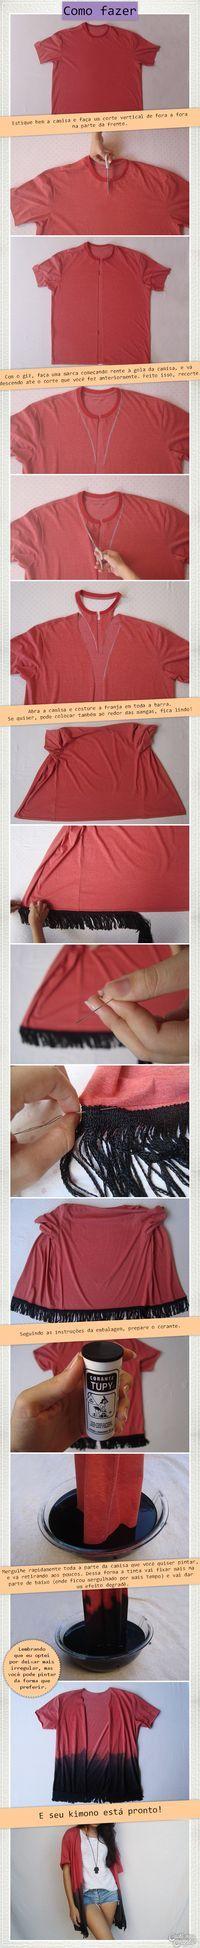 DIY Kimono | DIY Fashion | DIY Quimono | More details on http://www.cademeuchapeu.com/diy-kimono